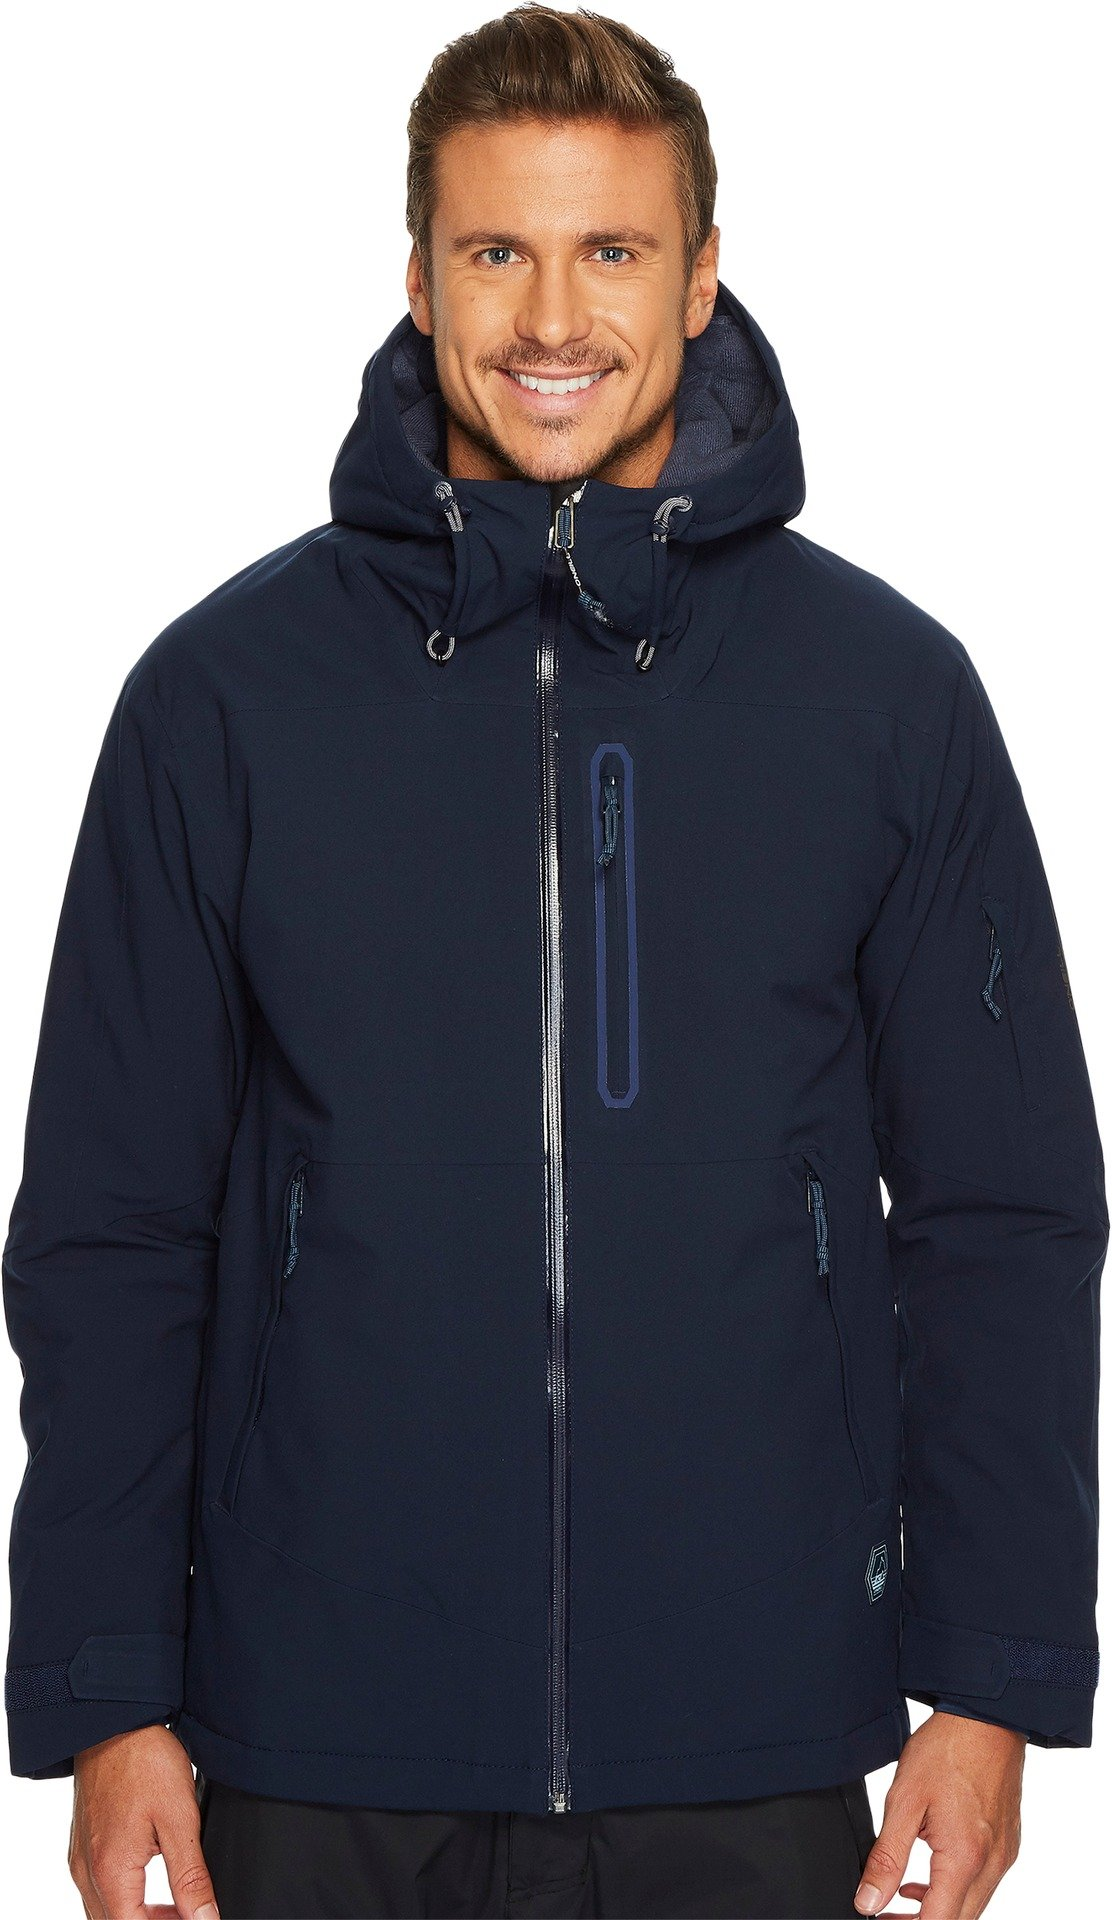 O'Neill Mens Jeremy Jones Rider Jacket Ink Blue 1 LG One Size